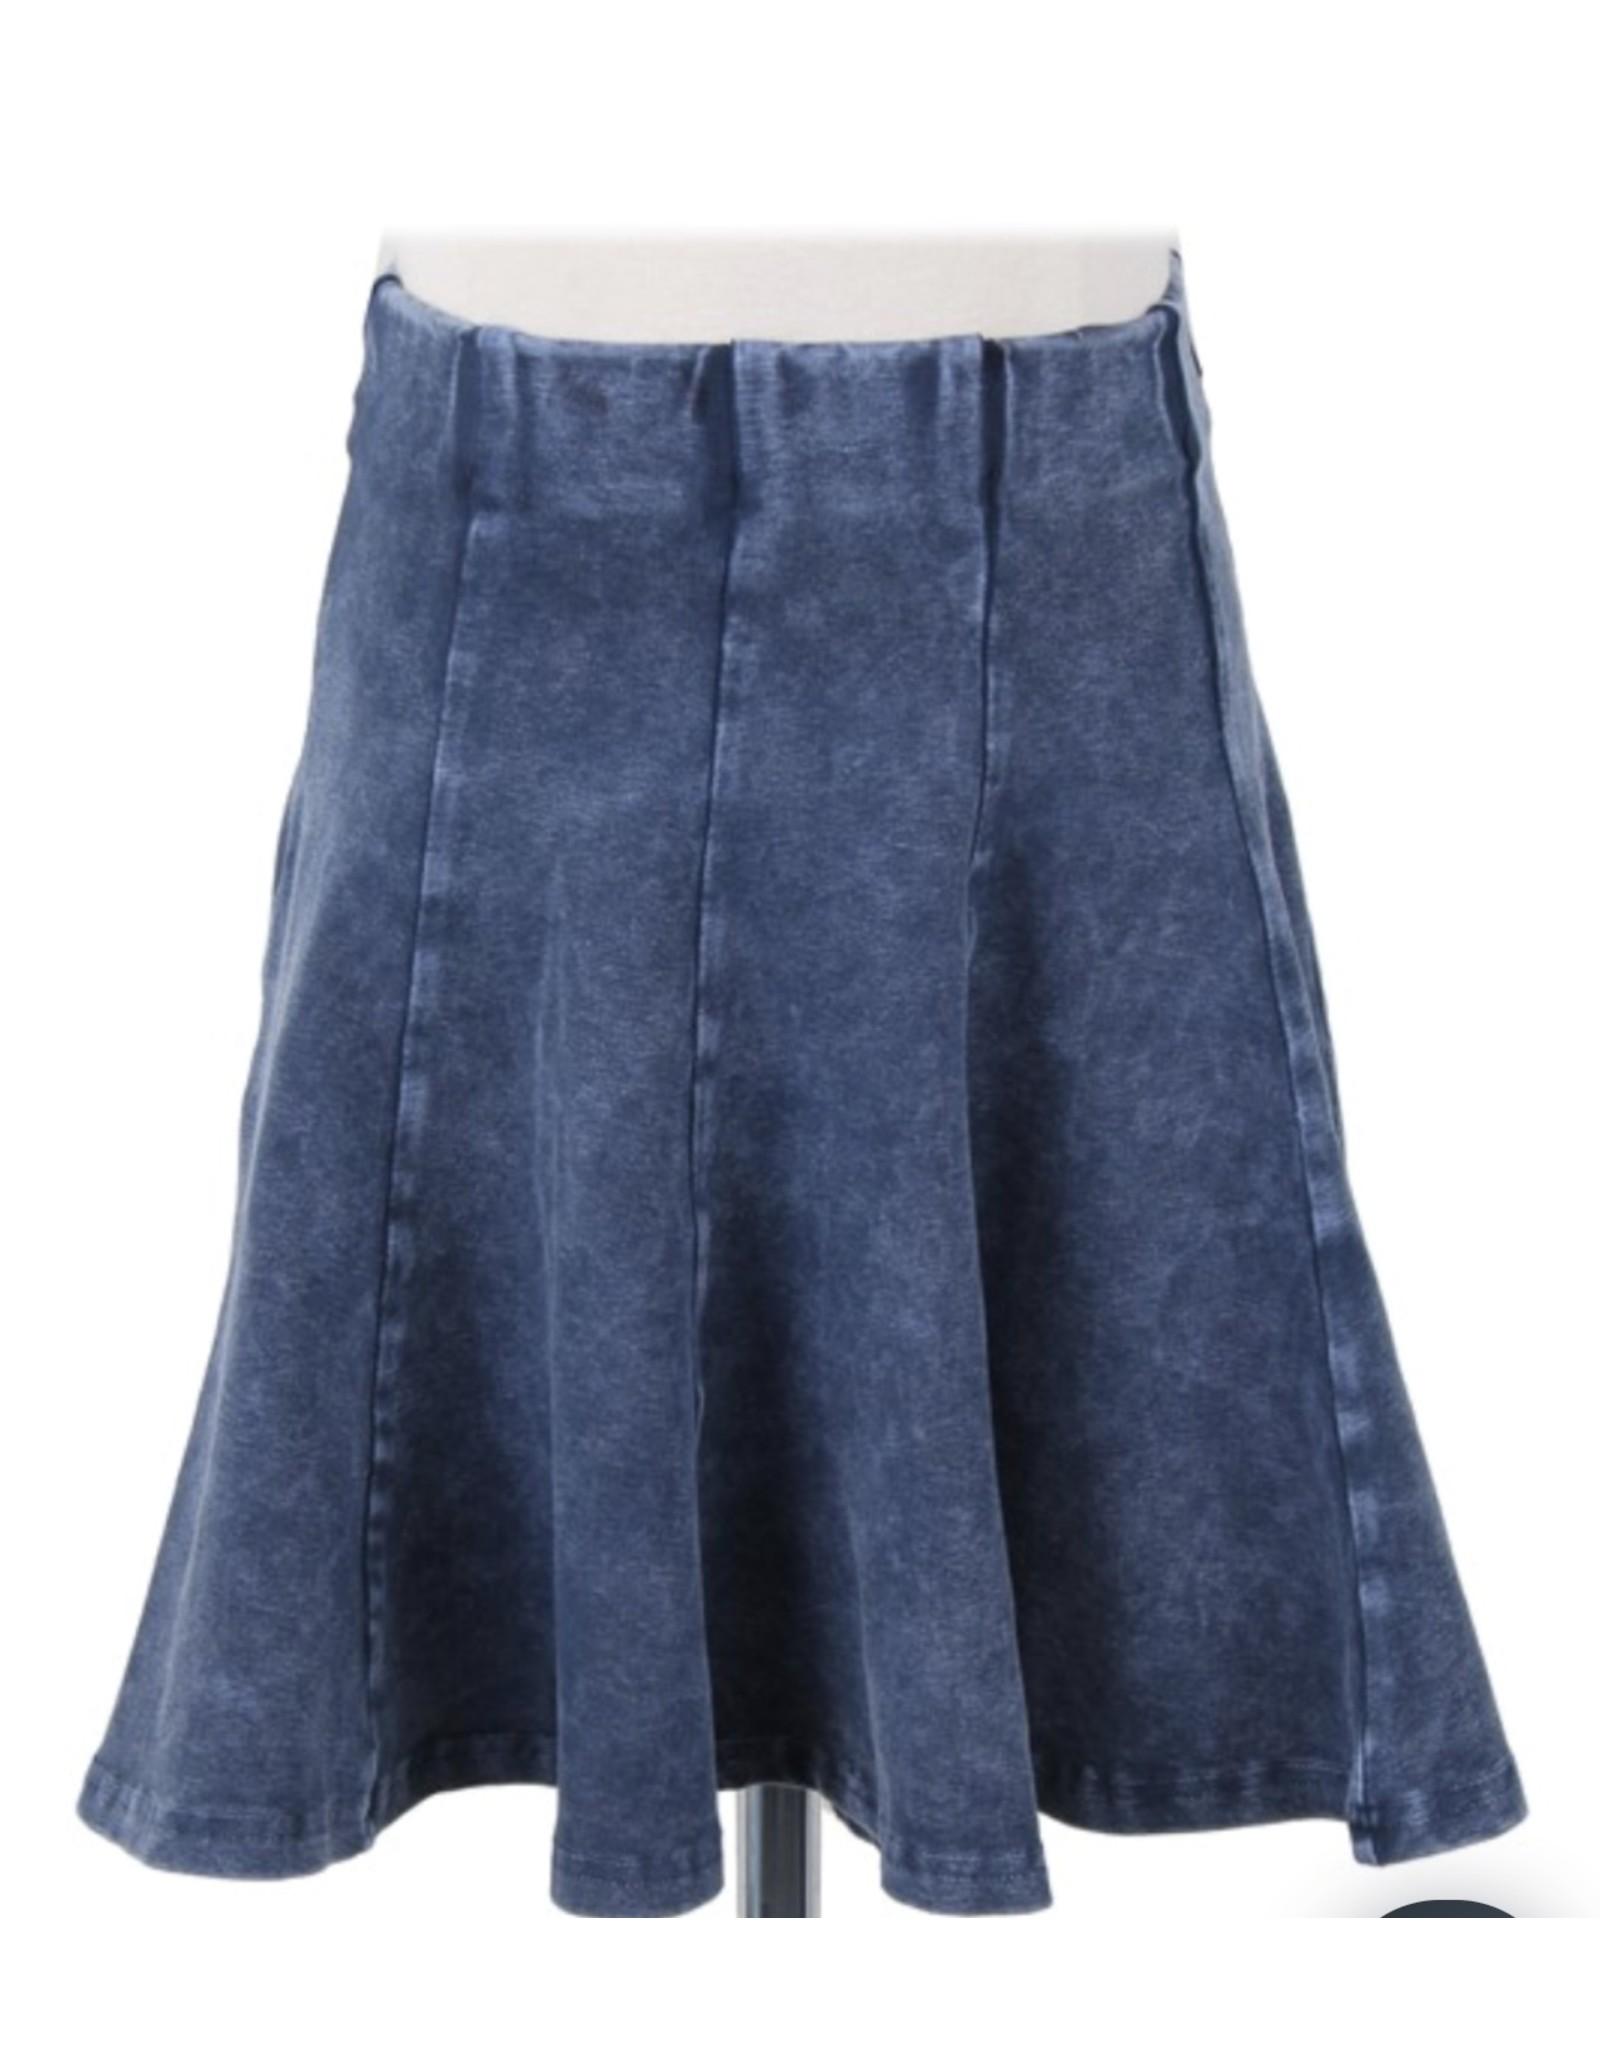 Kiki Riki Kiki Riki Girls Stone Wash Panel Skirts 41458